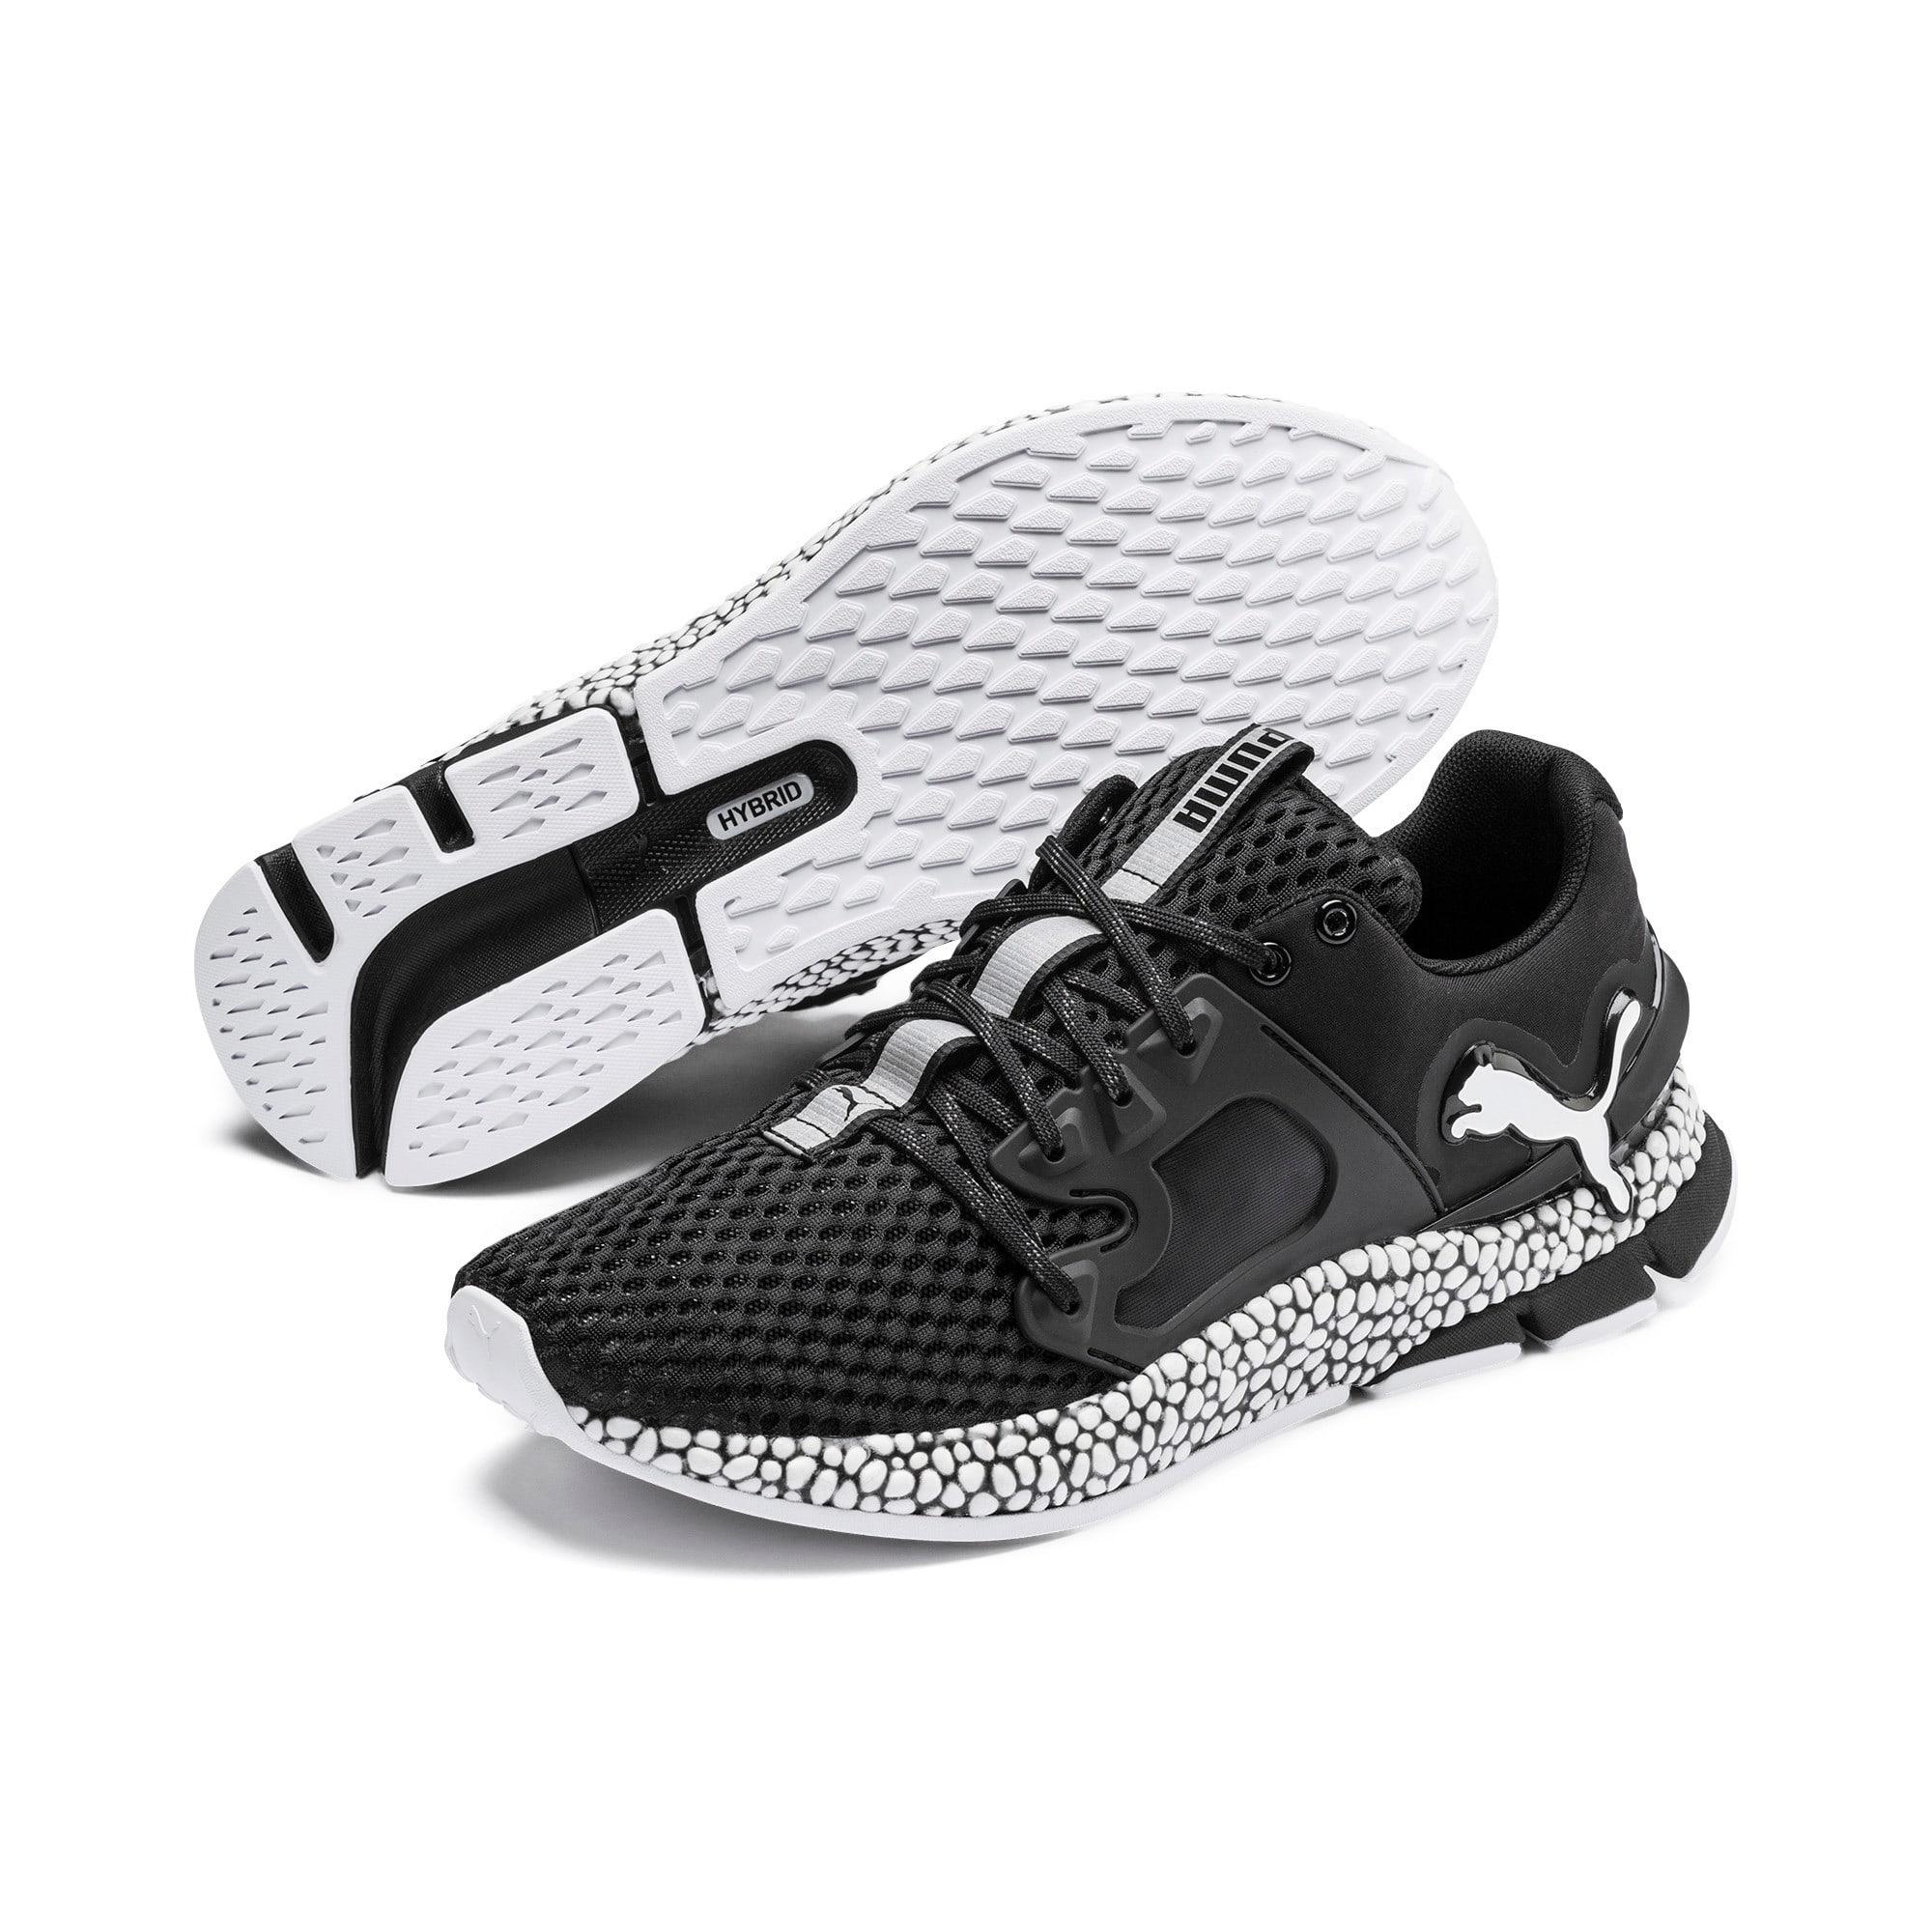 Thumbnail 3 of HYBRID Sky Men's Running Shoes, Puma Black-Puma White, medium